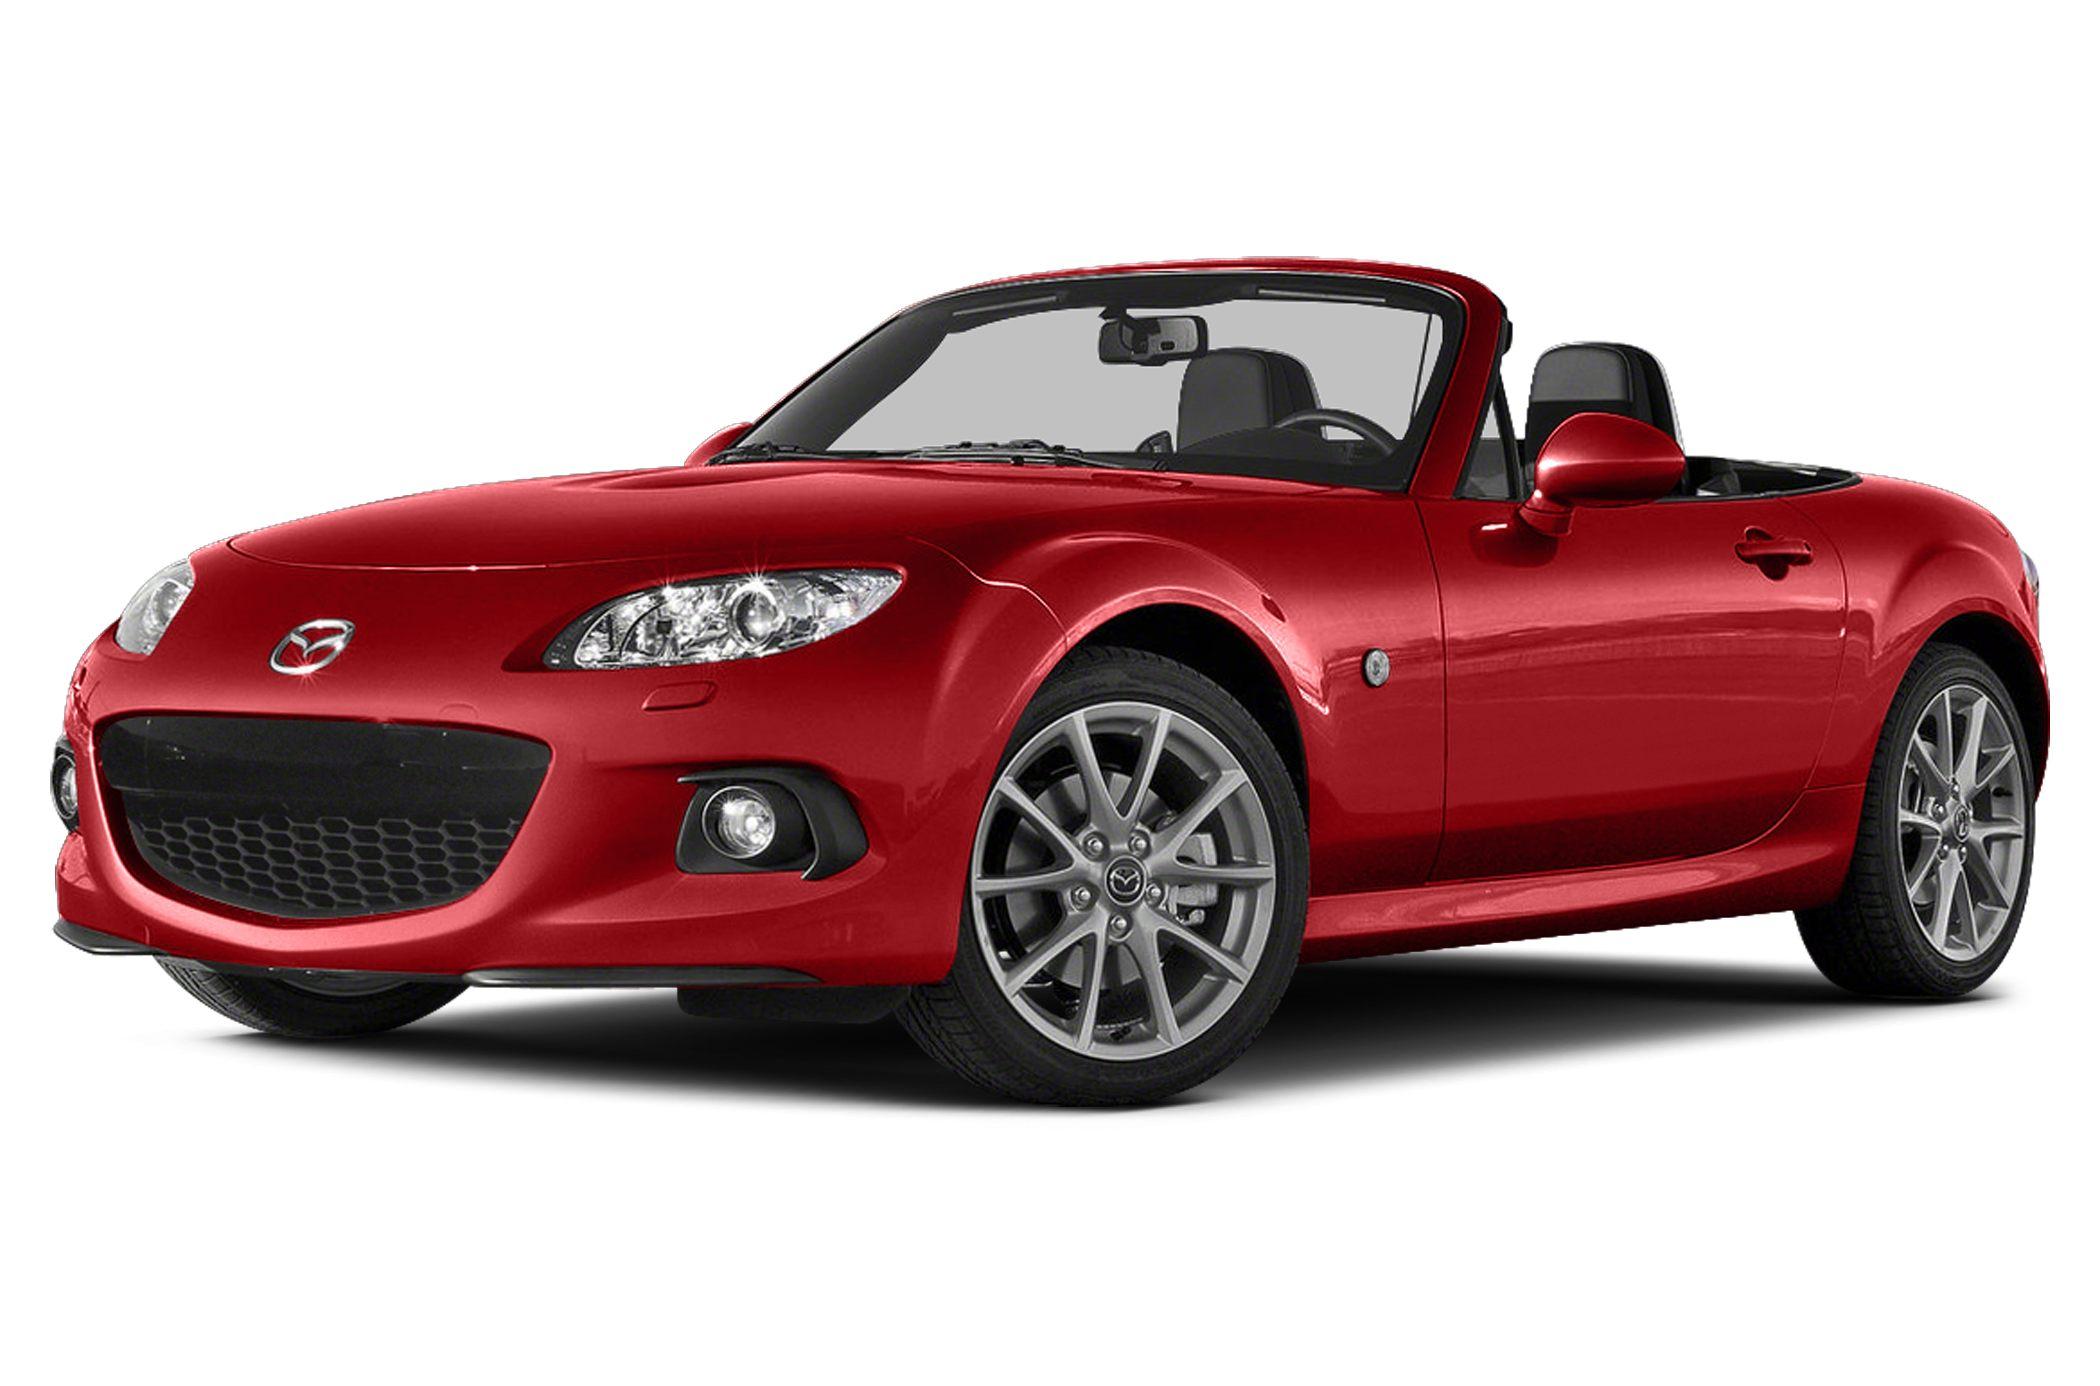 2013 Mazda Miata Club Miles 4798Color Crystal White Pearl Stock ZP232587 VIN JM1NC2LF1D02325